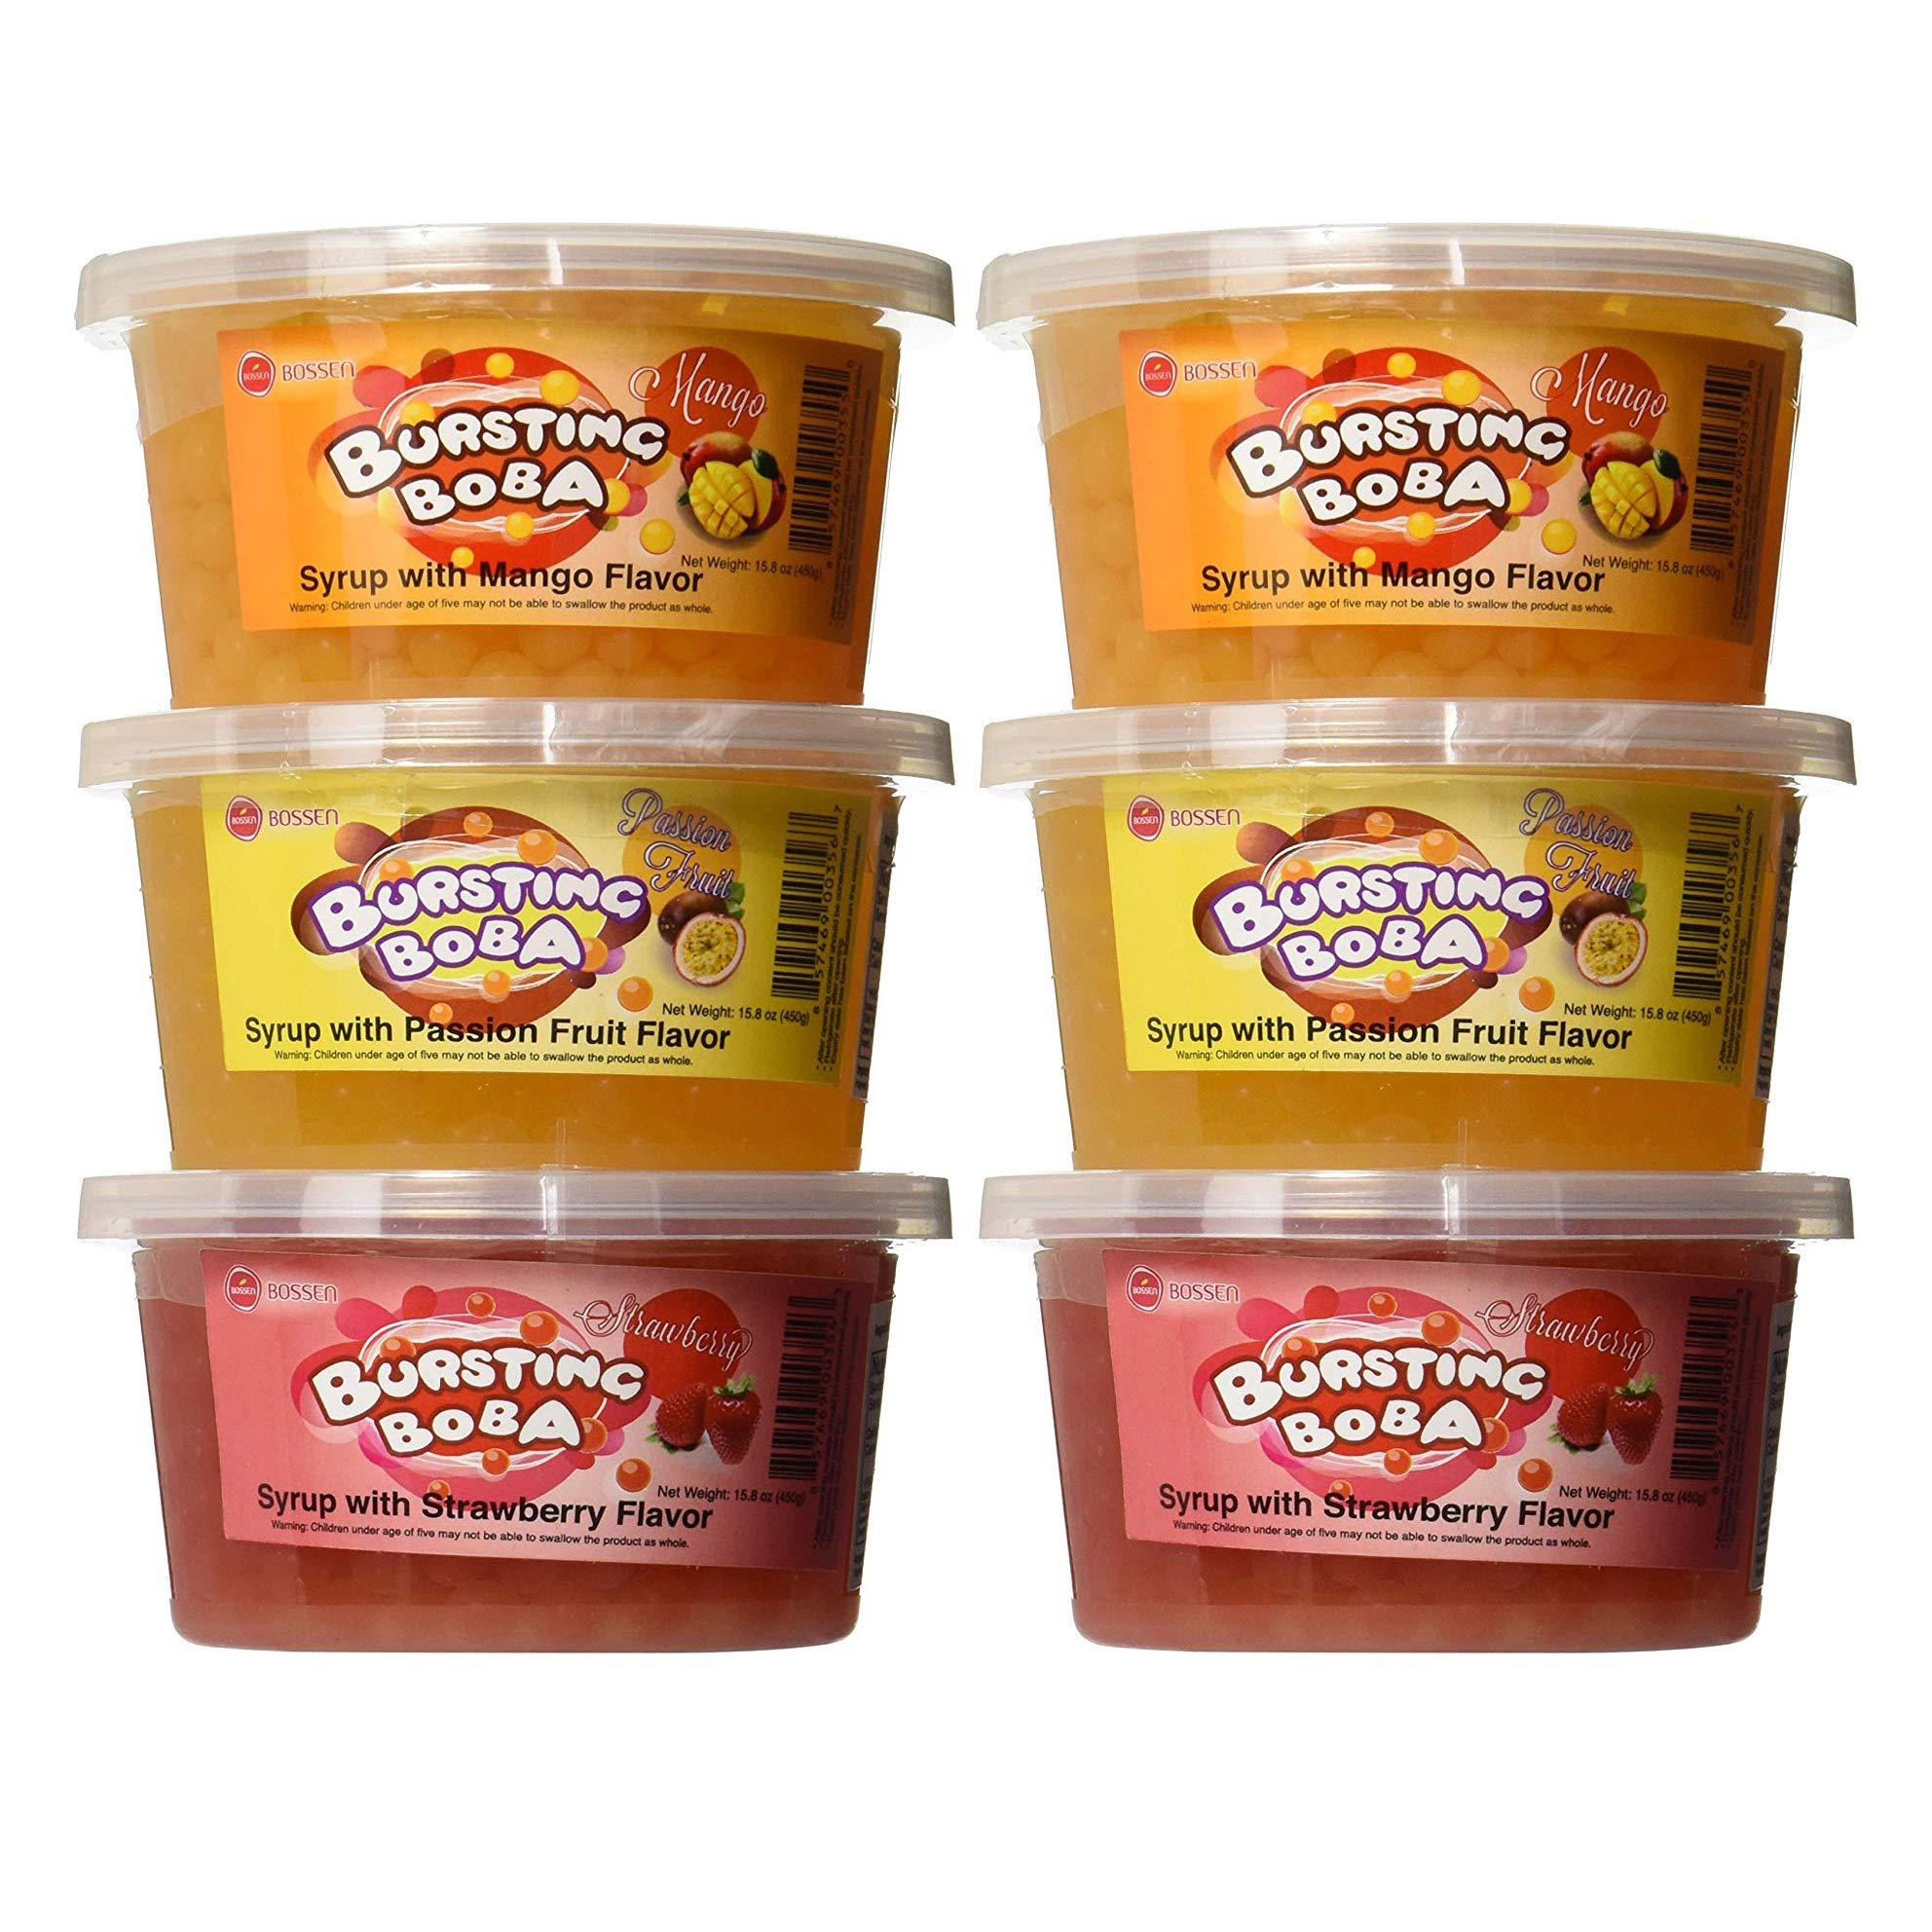 Bursting Popping Boba 3 Flavor Fun Pack 6 Pack - 2 Mango 2 Passion Fruit 2 Strawberry Bursting Boba by Bossen